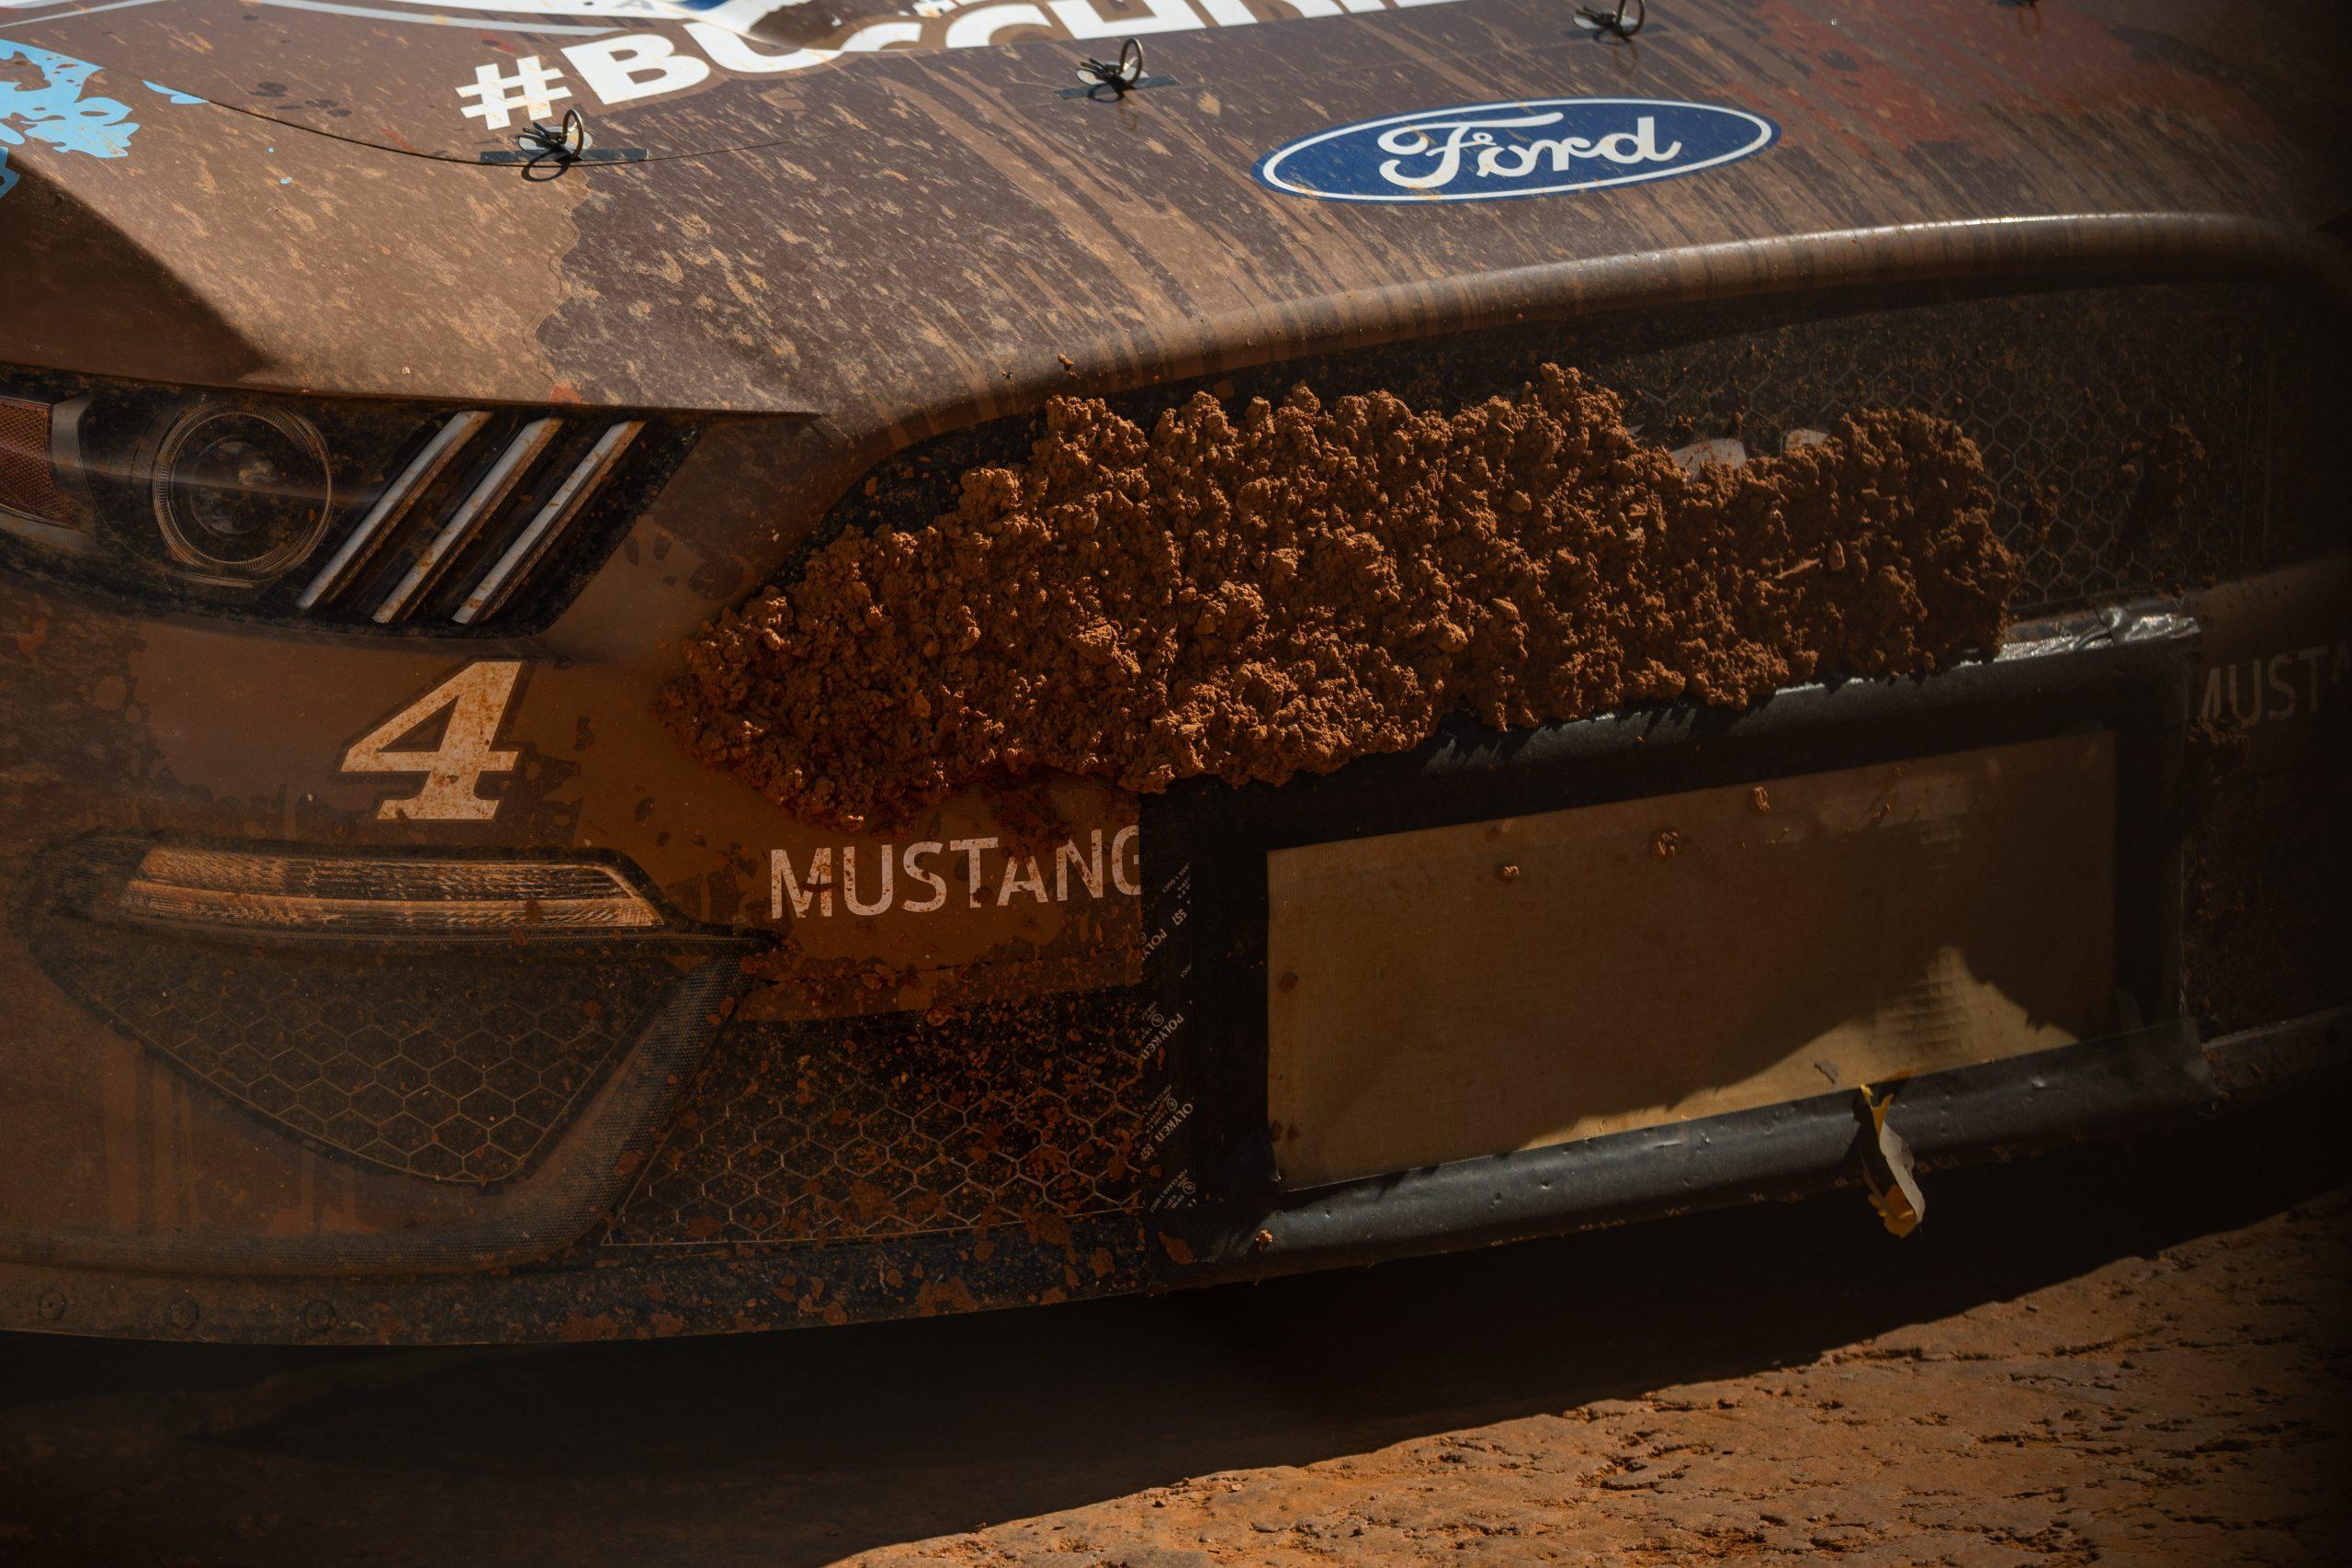 NASCAR dirt Bristol